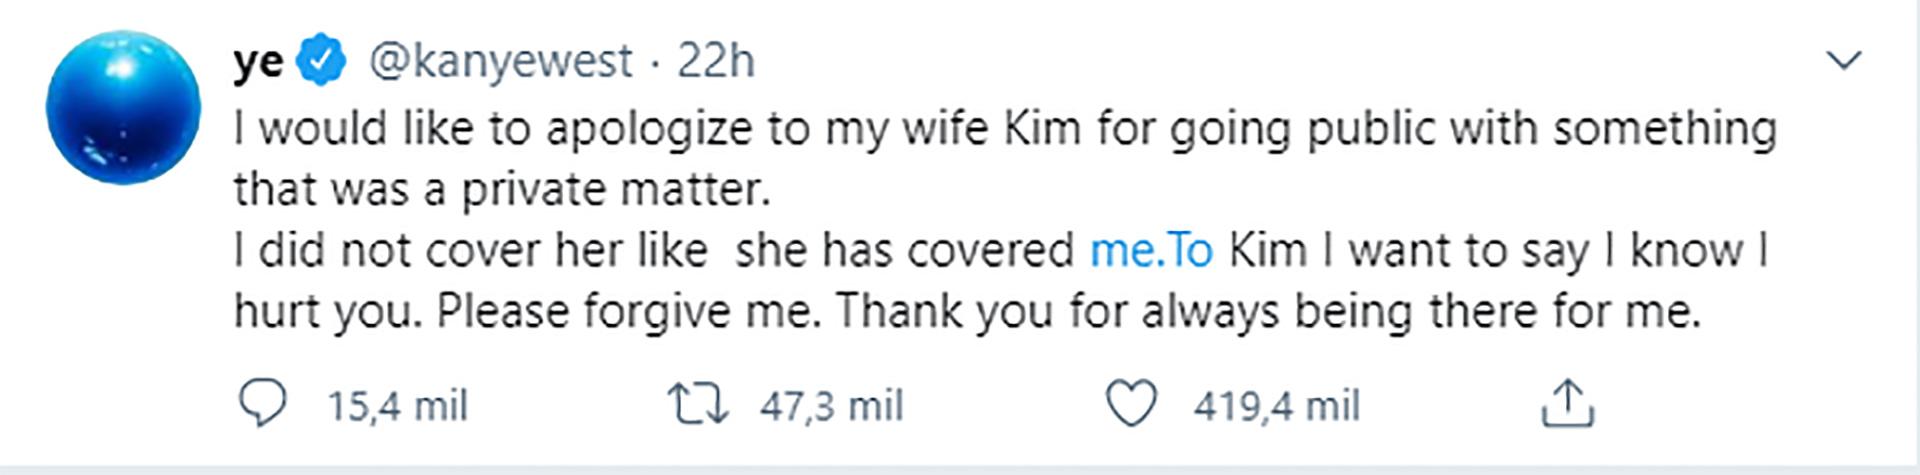 El pedido de disculpas de Kanye West a Kim Kardashian